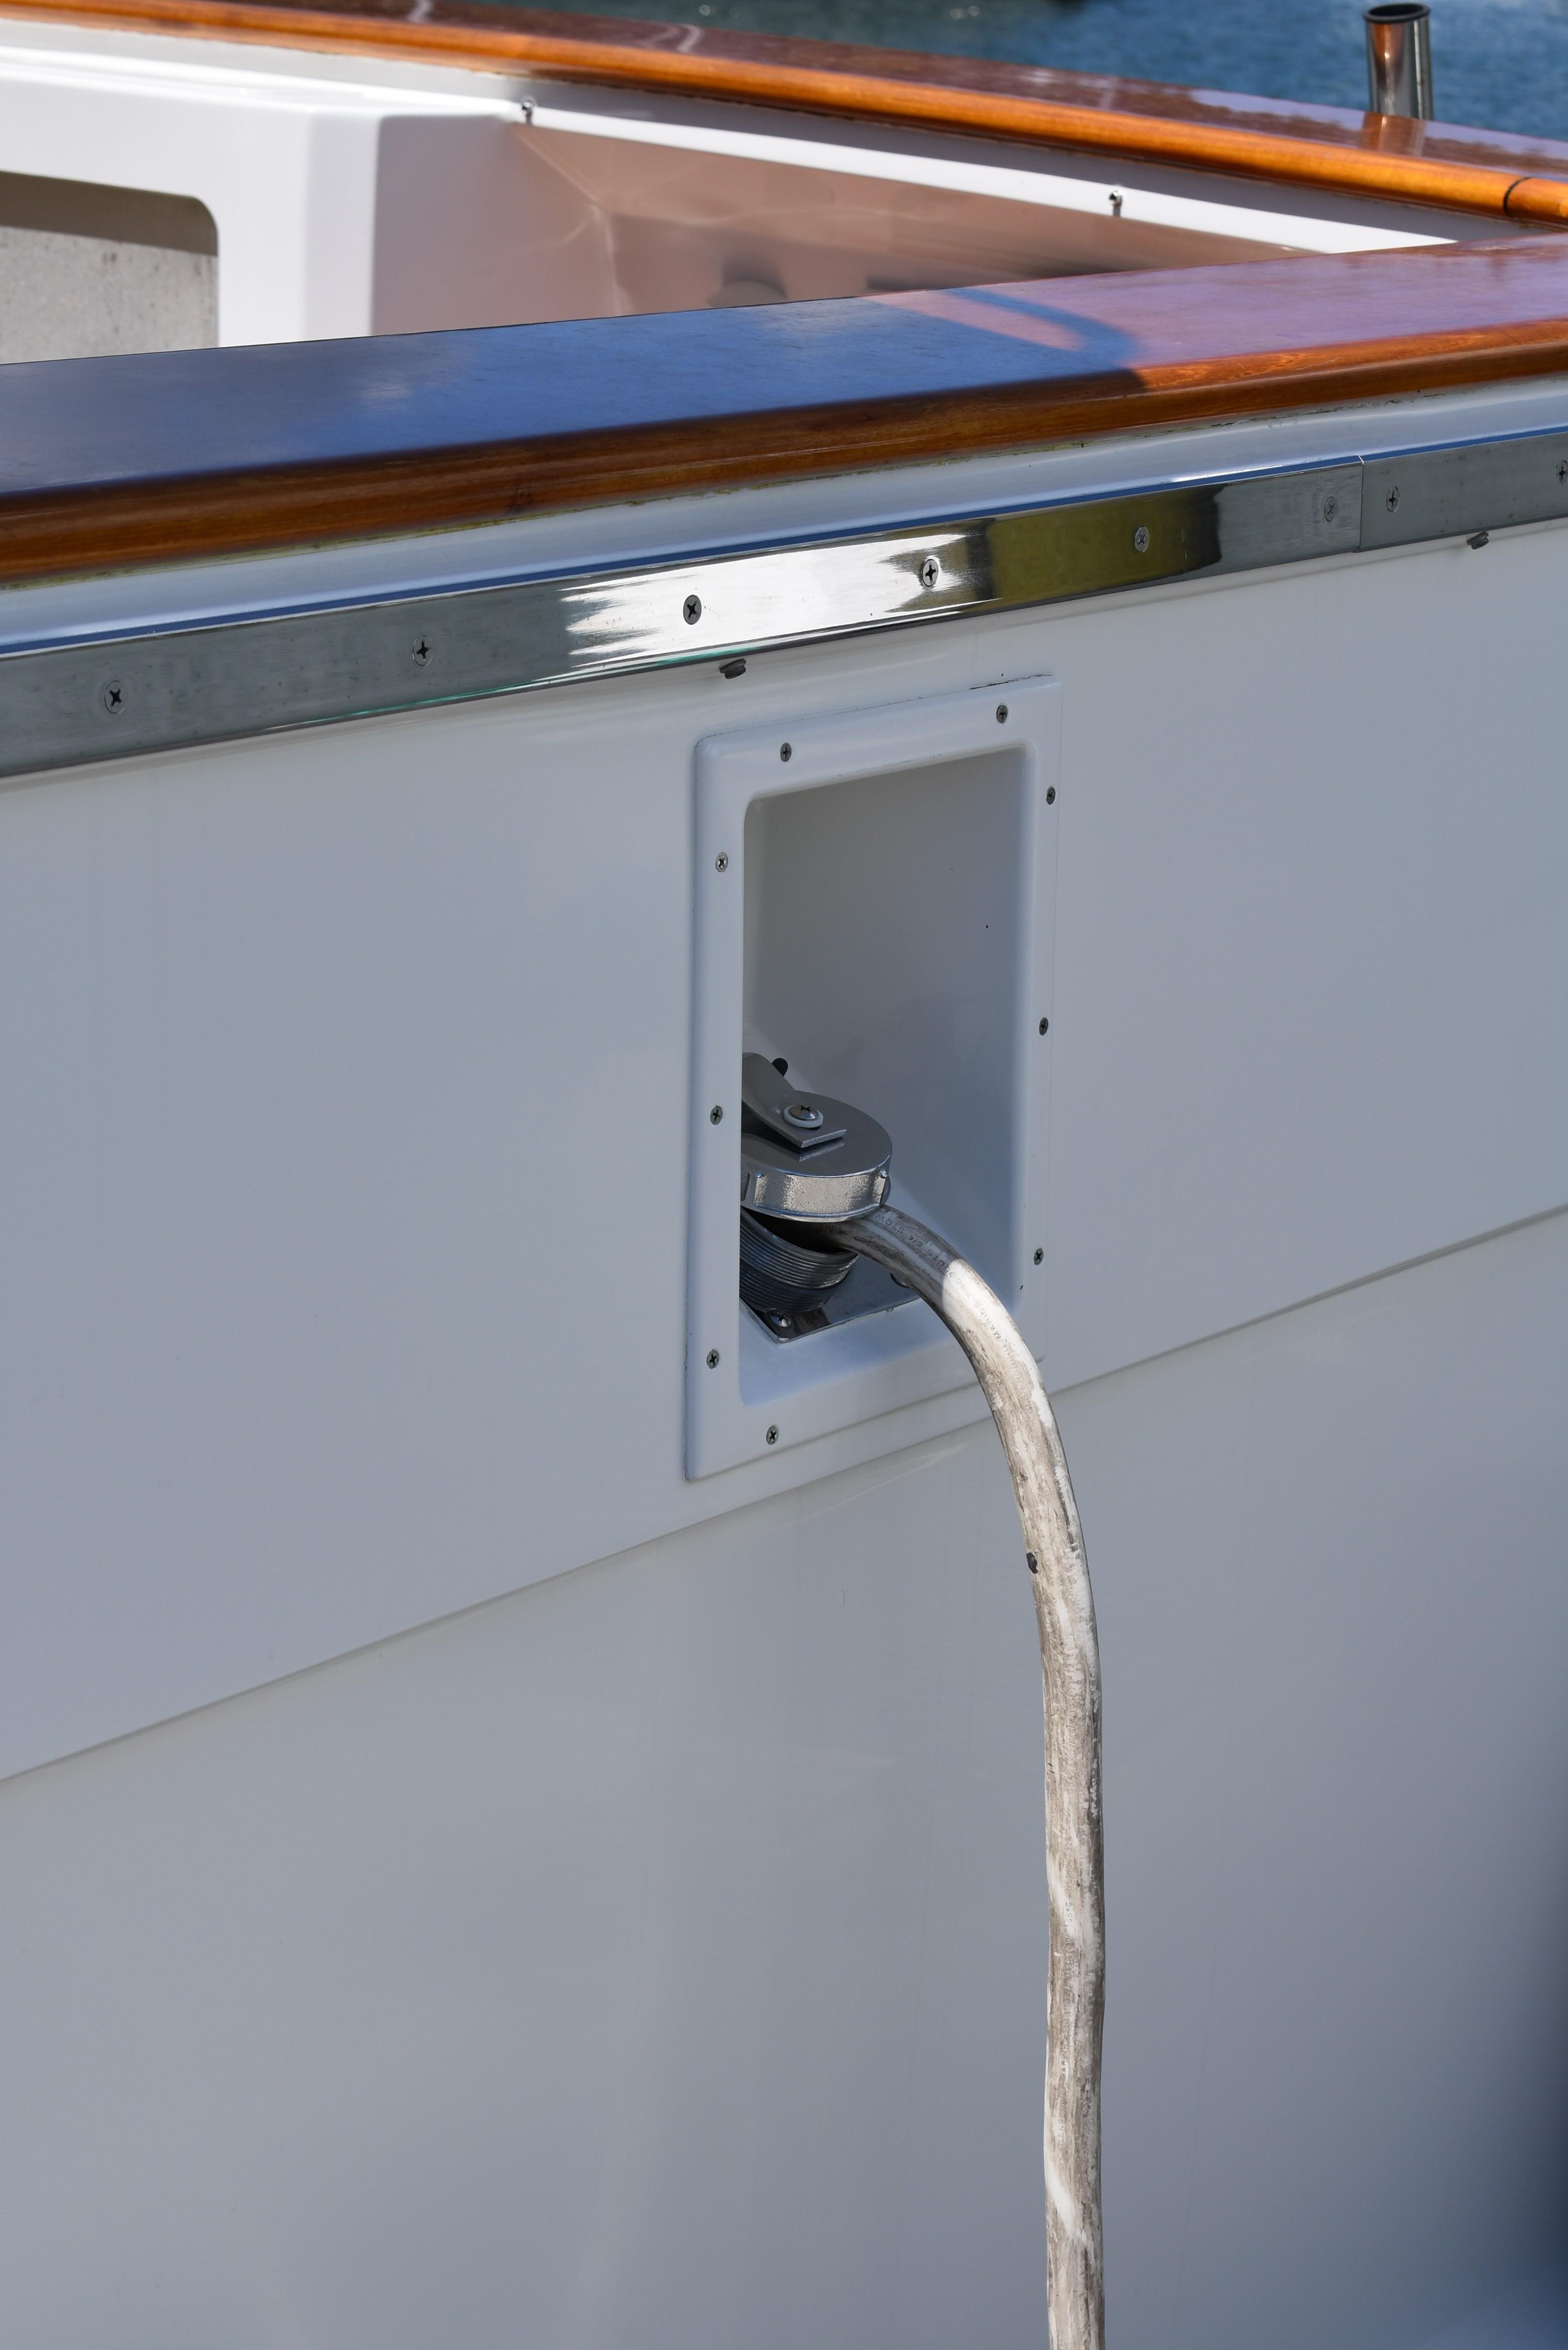 Glenndinning shore power cable retractor